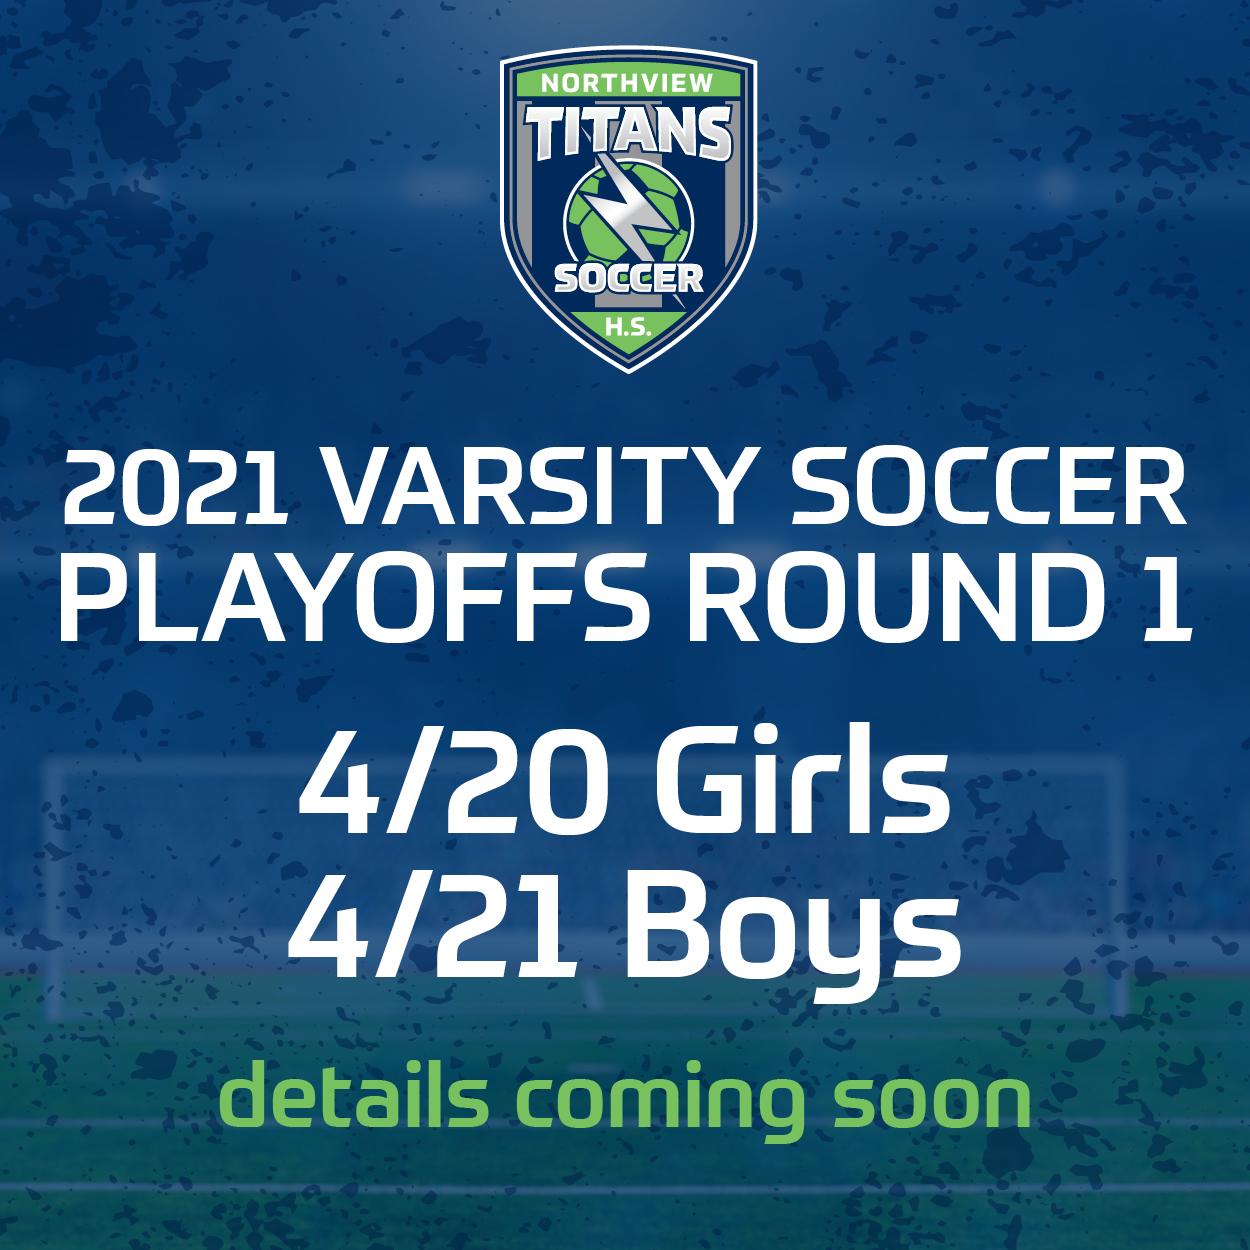 Both Varsity Soccer Teams Qualify for Playoffs!